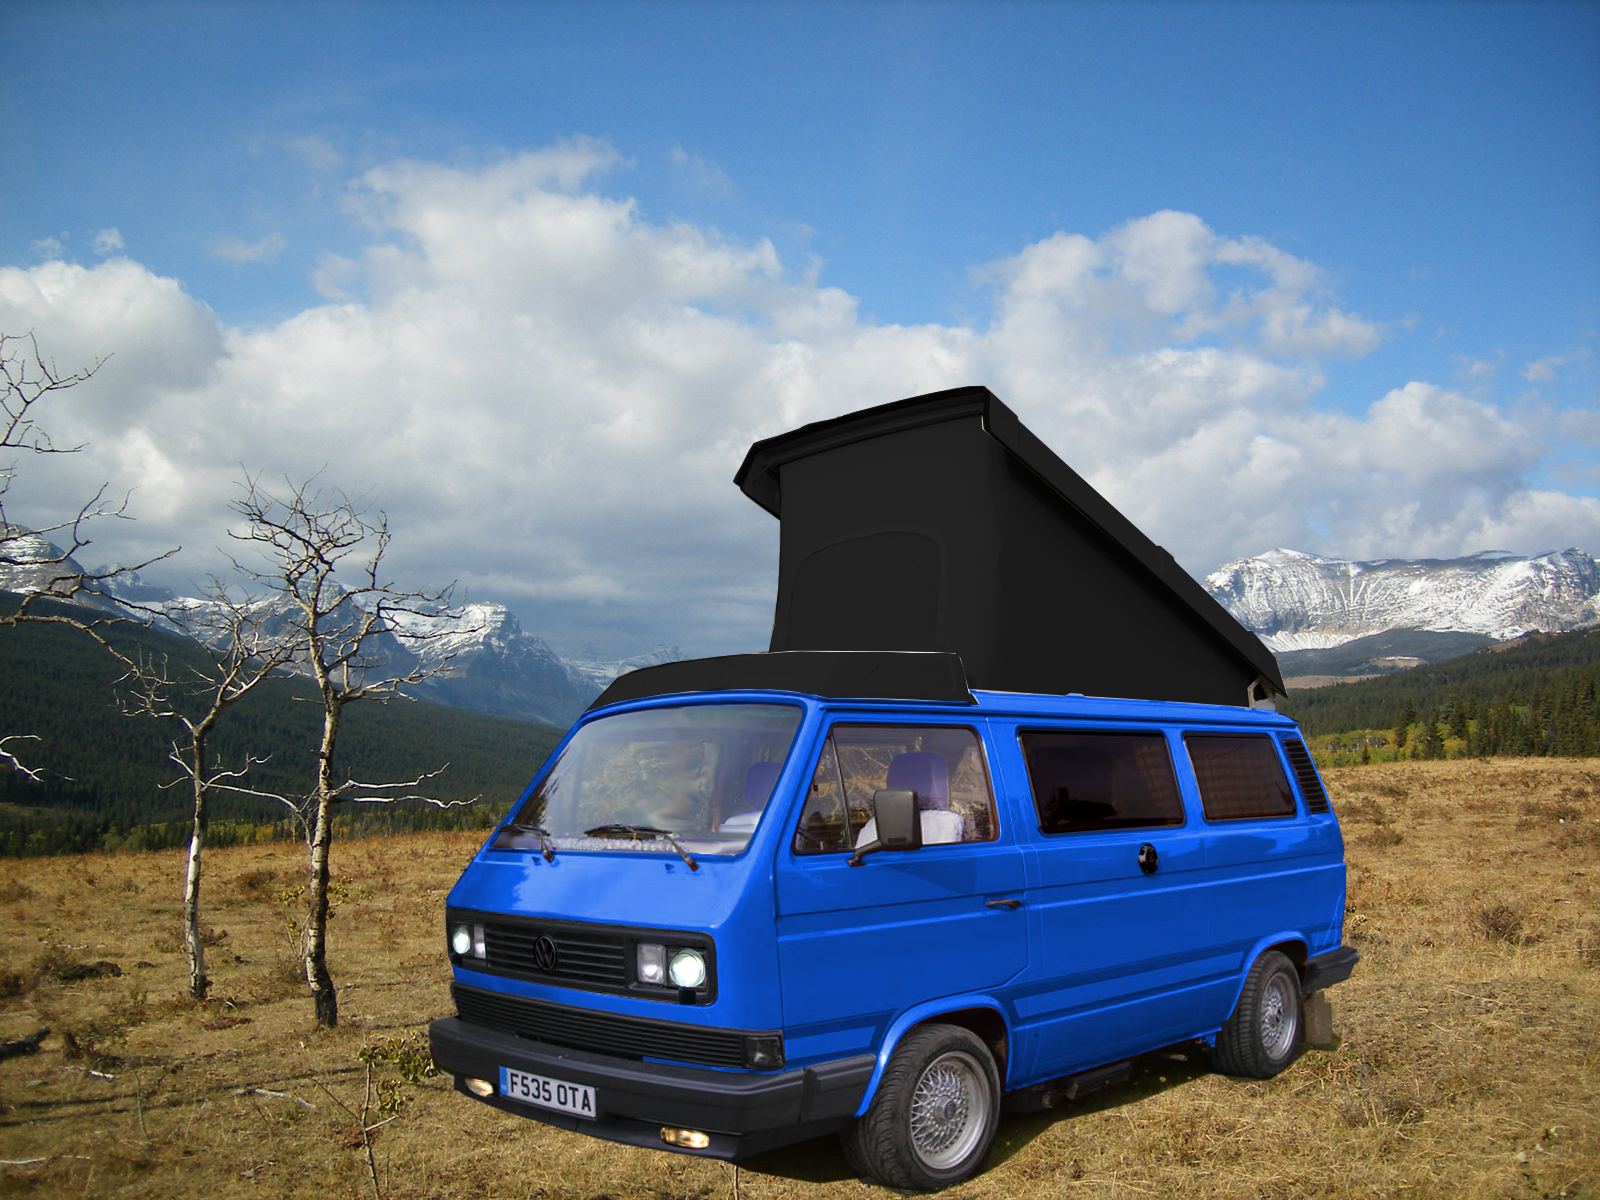 fake vw t3 westfalia deine automeile im netz. Black Bedroom Furniture Sets. Home Design Ideas